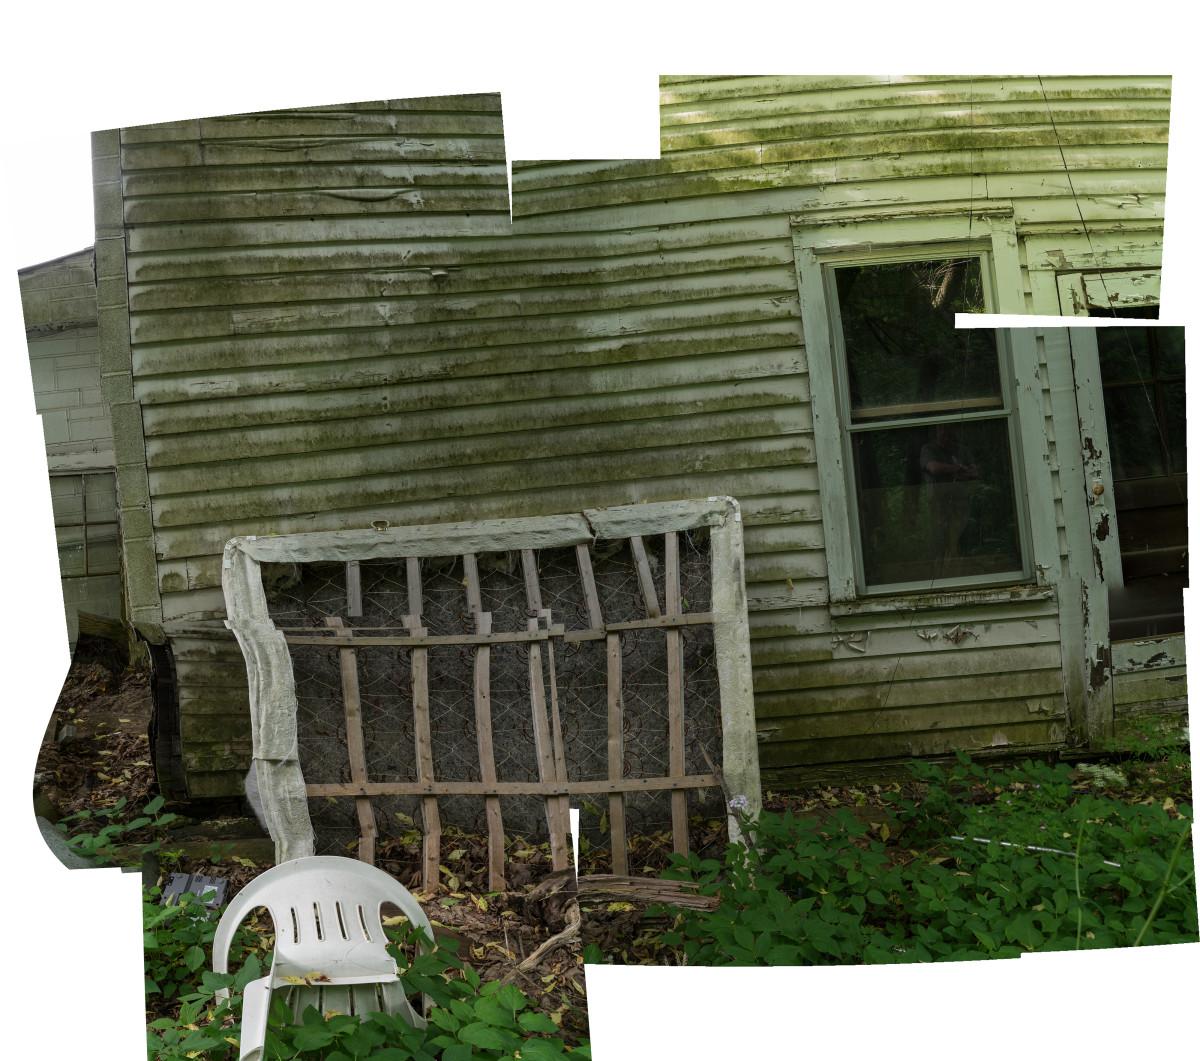 Backyard Mold Trash by Alan Powell